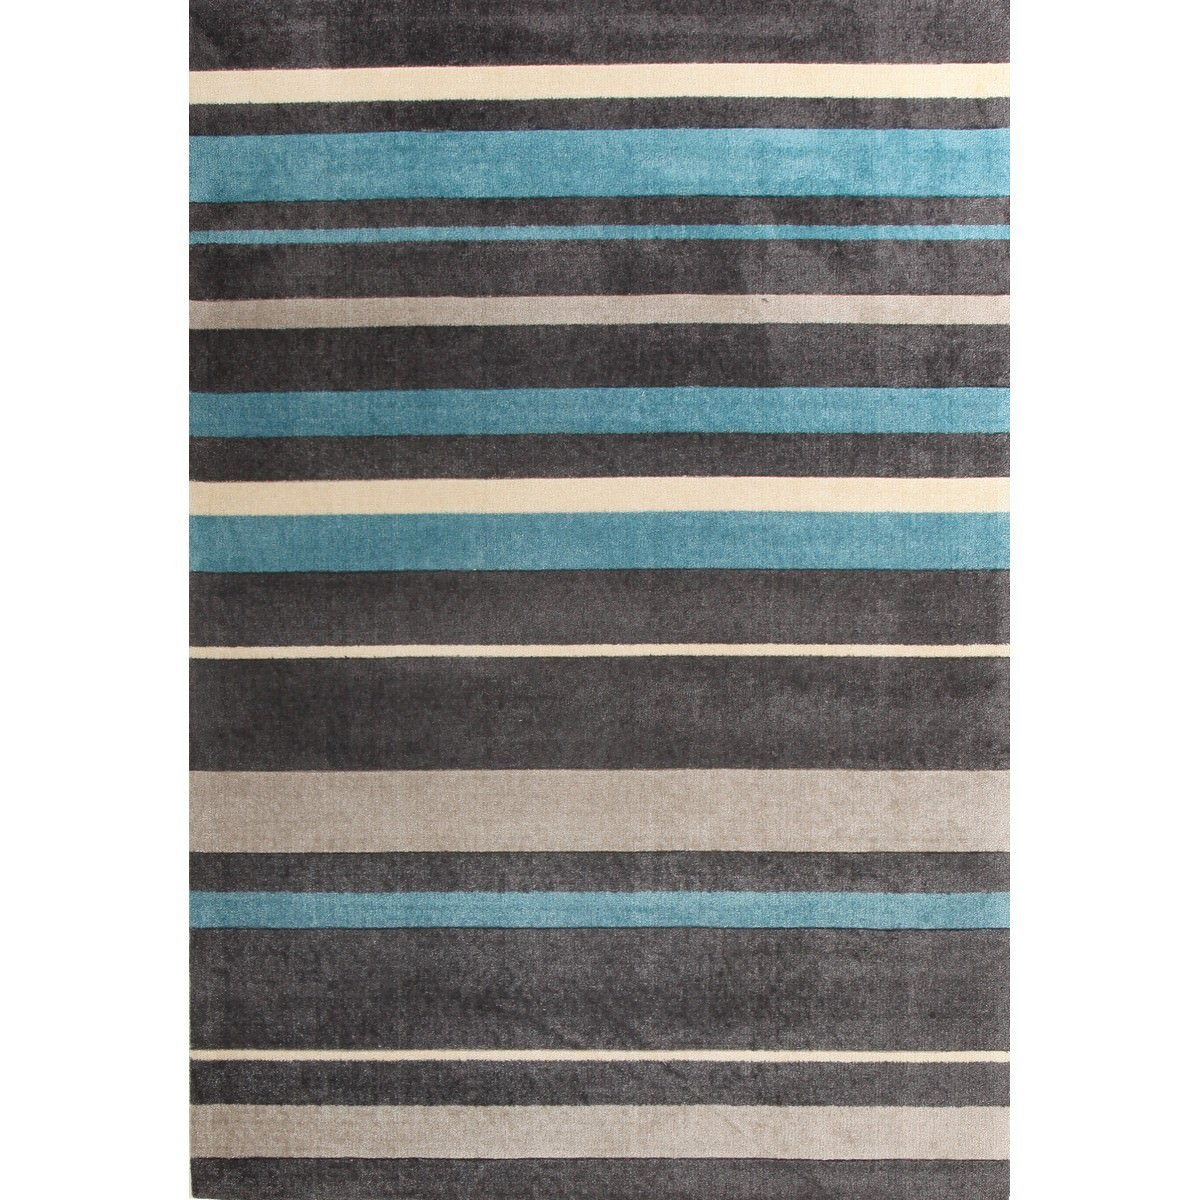 City Stylish Stripe Modern Rug, 280x190cm, Charcoal / Blue